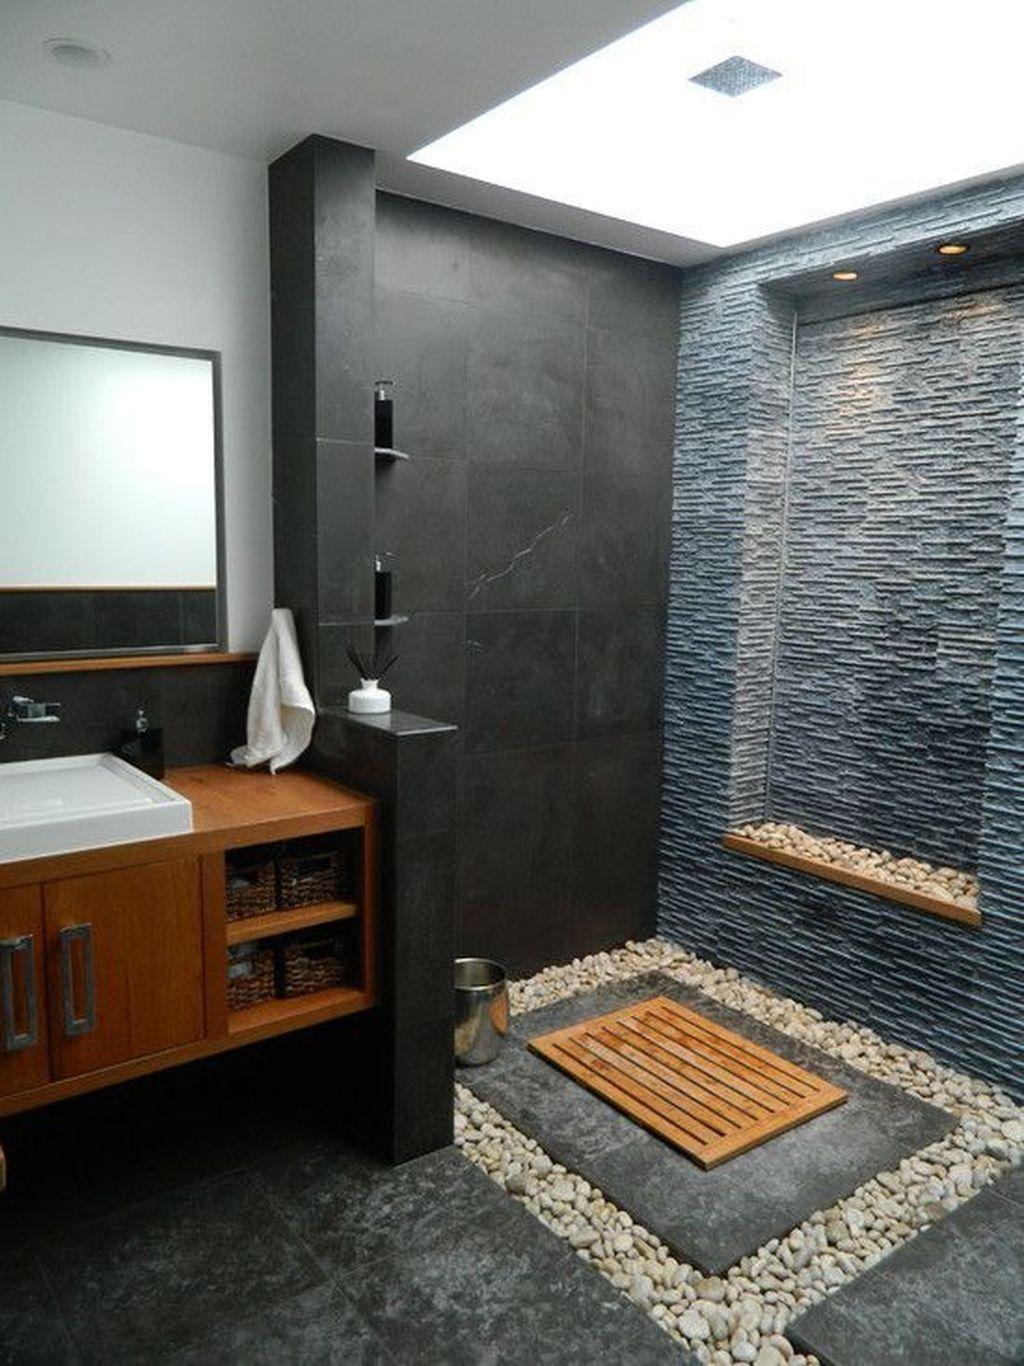 Photo of 40+ Inspiring Luxury Bathroom Design Ideas